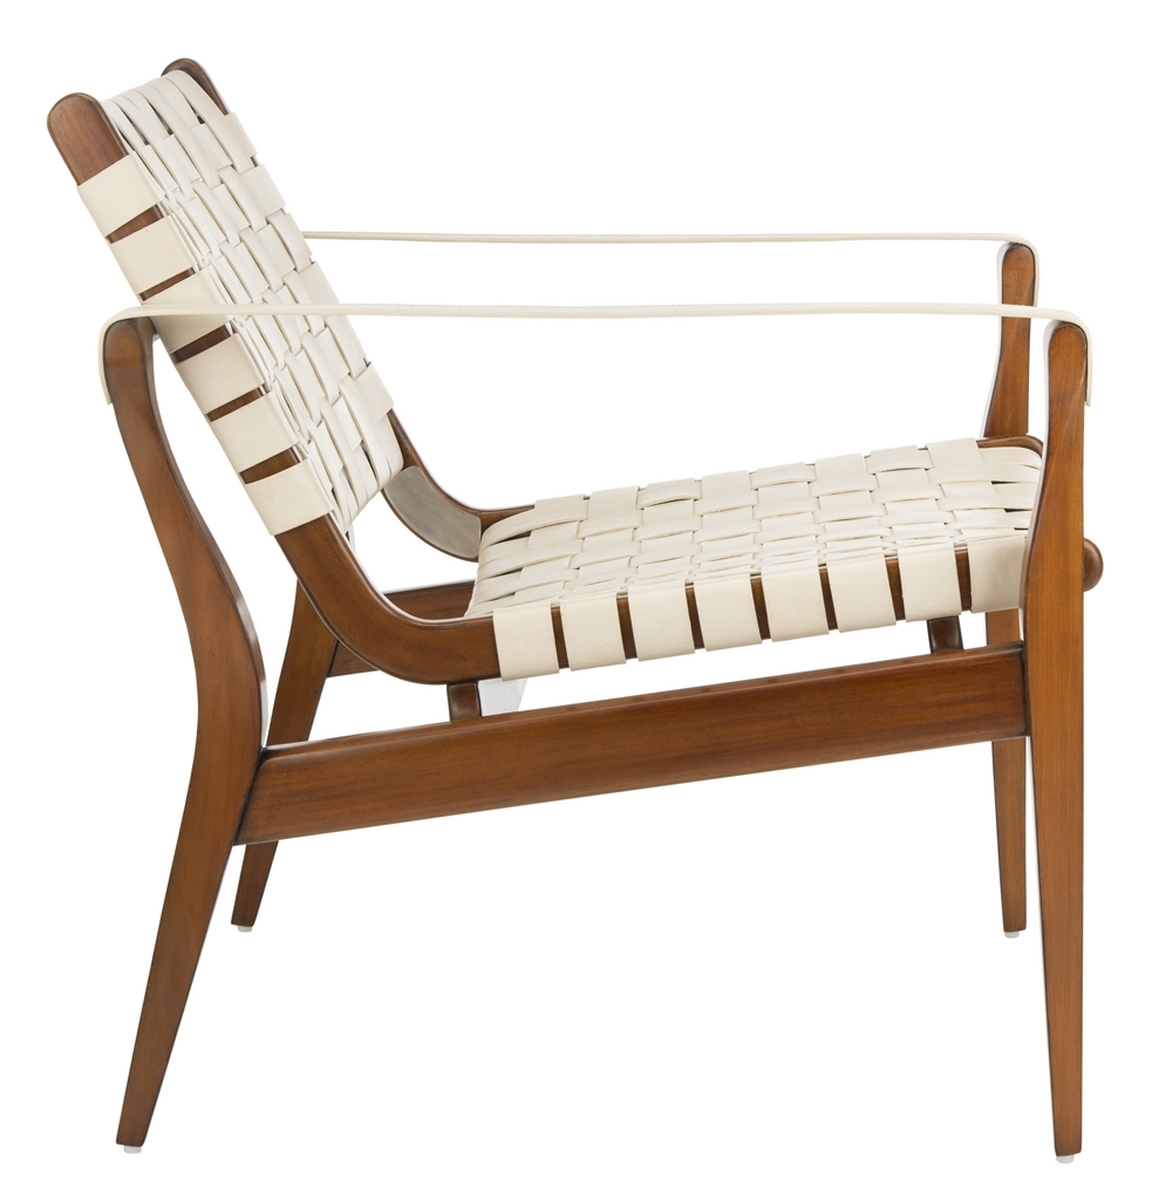 Stupendous Mid Century Modern Woven Leather Strap Armchair Safavieh Creativecarmelina Interior Chair Design Creativecarmelinacom